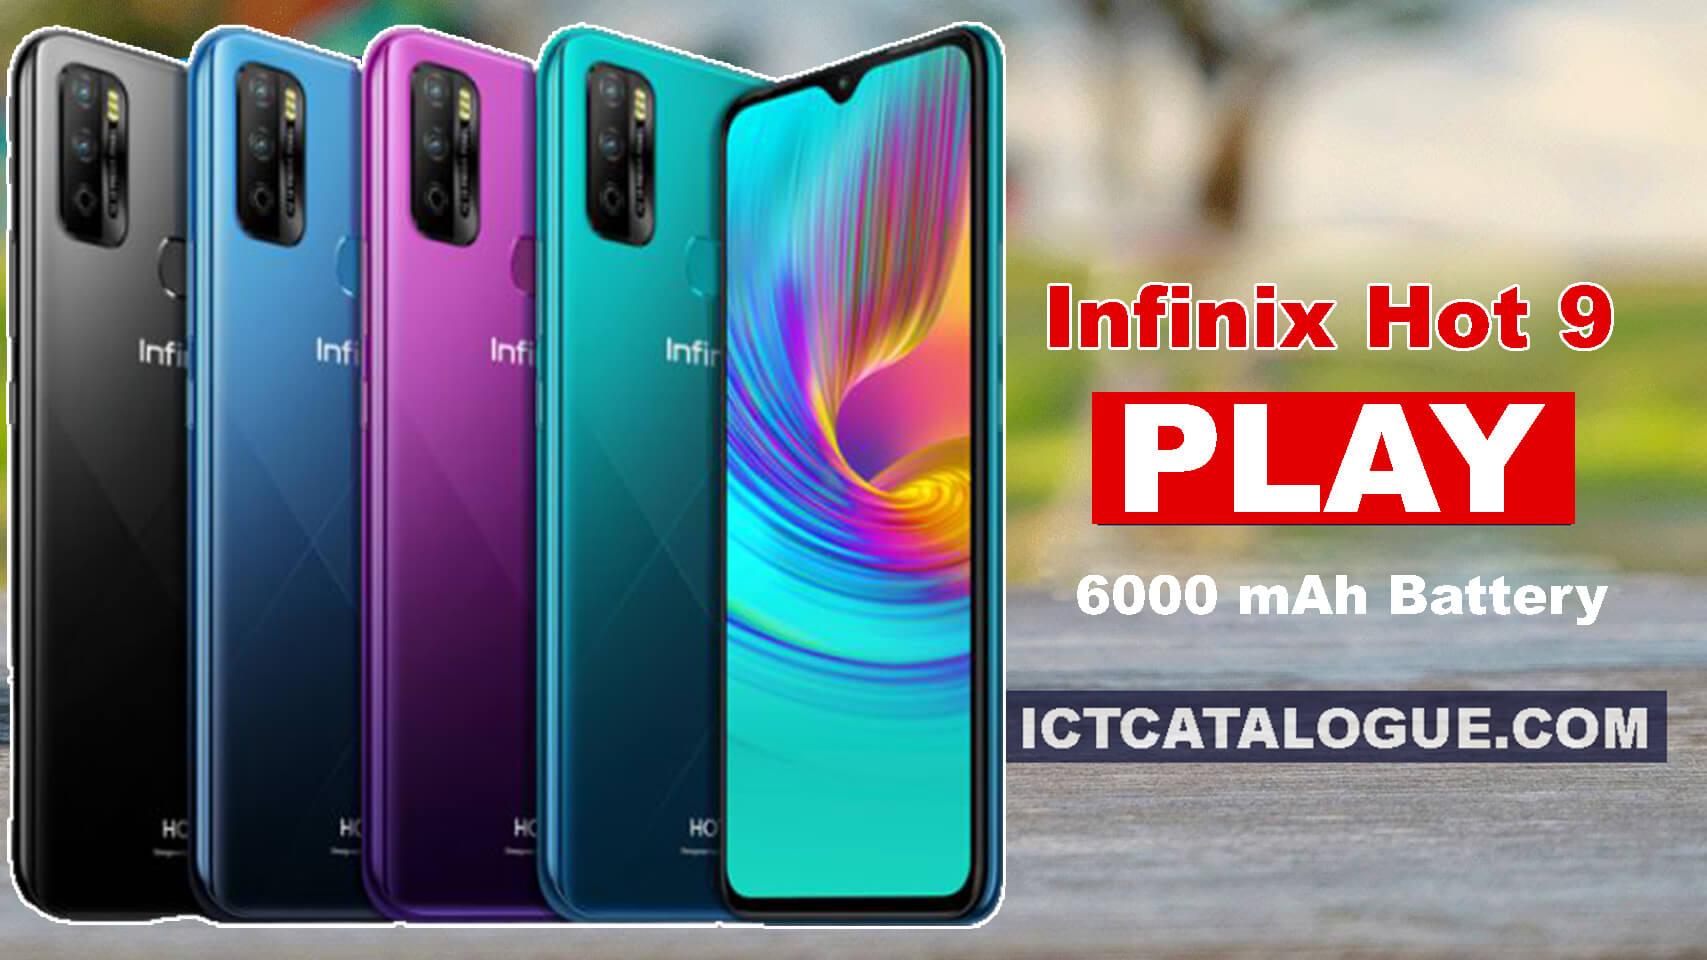 Infinix Hot 9 Play: First Infinix Hot 9 Phone With 6000 mAh Battery